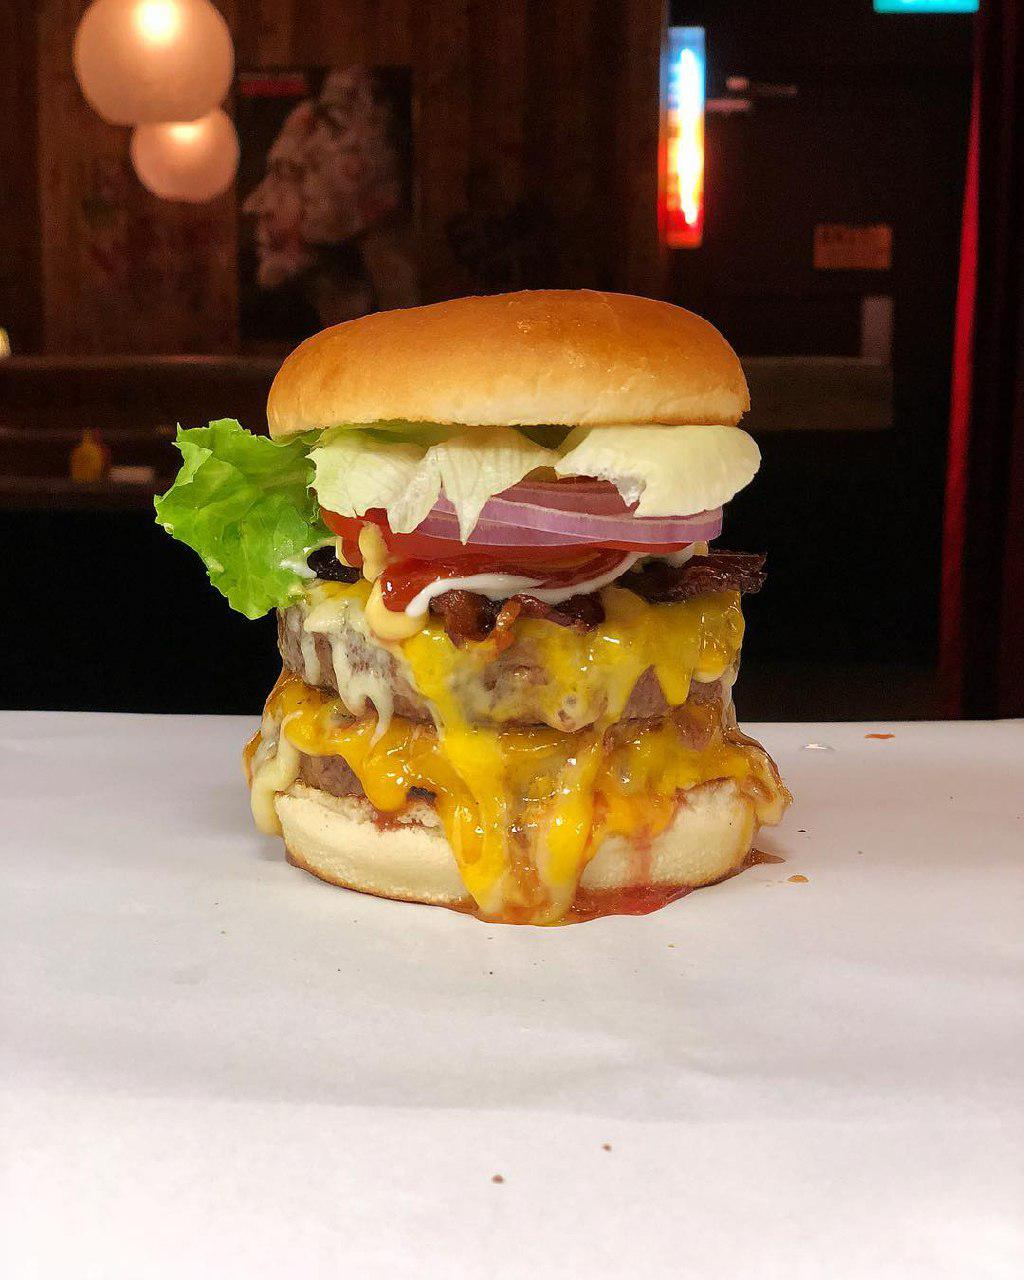 Double cheeseburger at Burget Joint Singapore